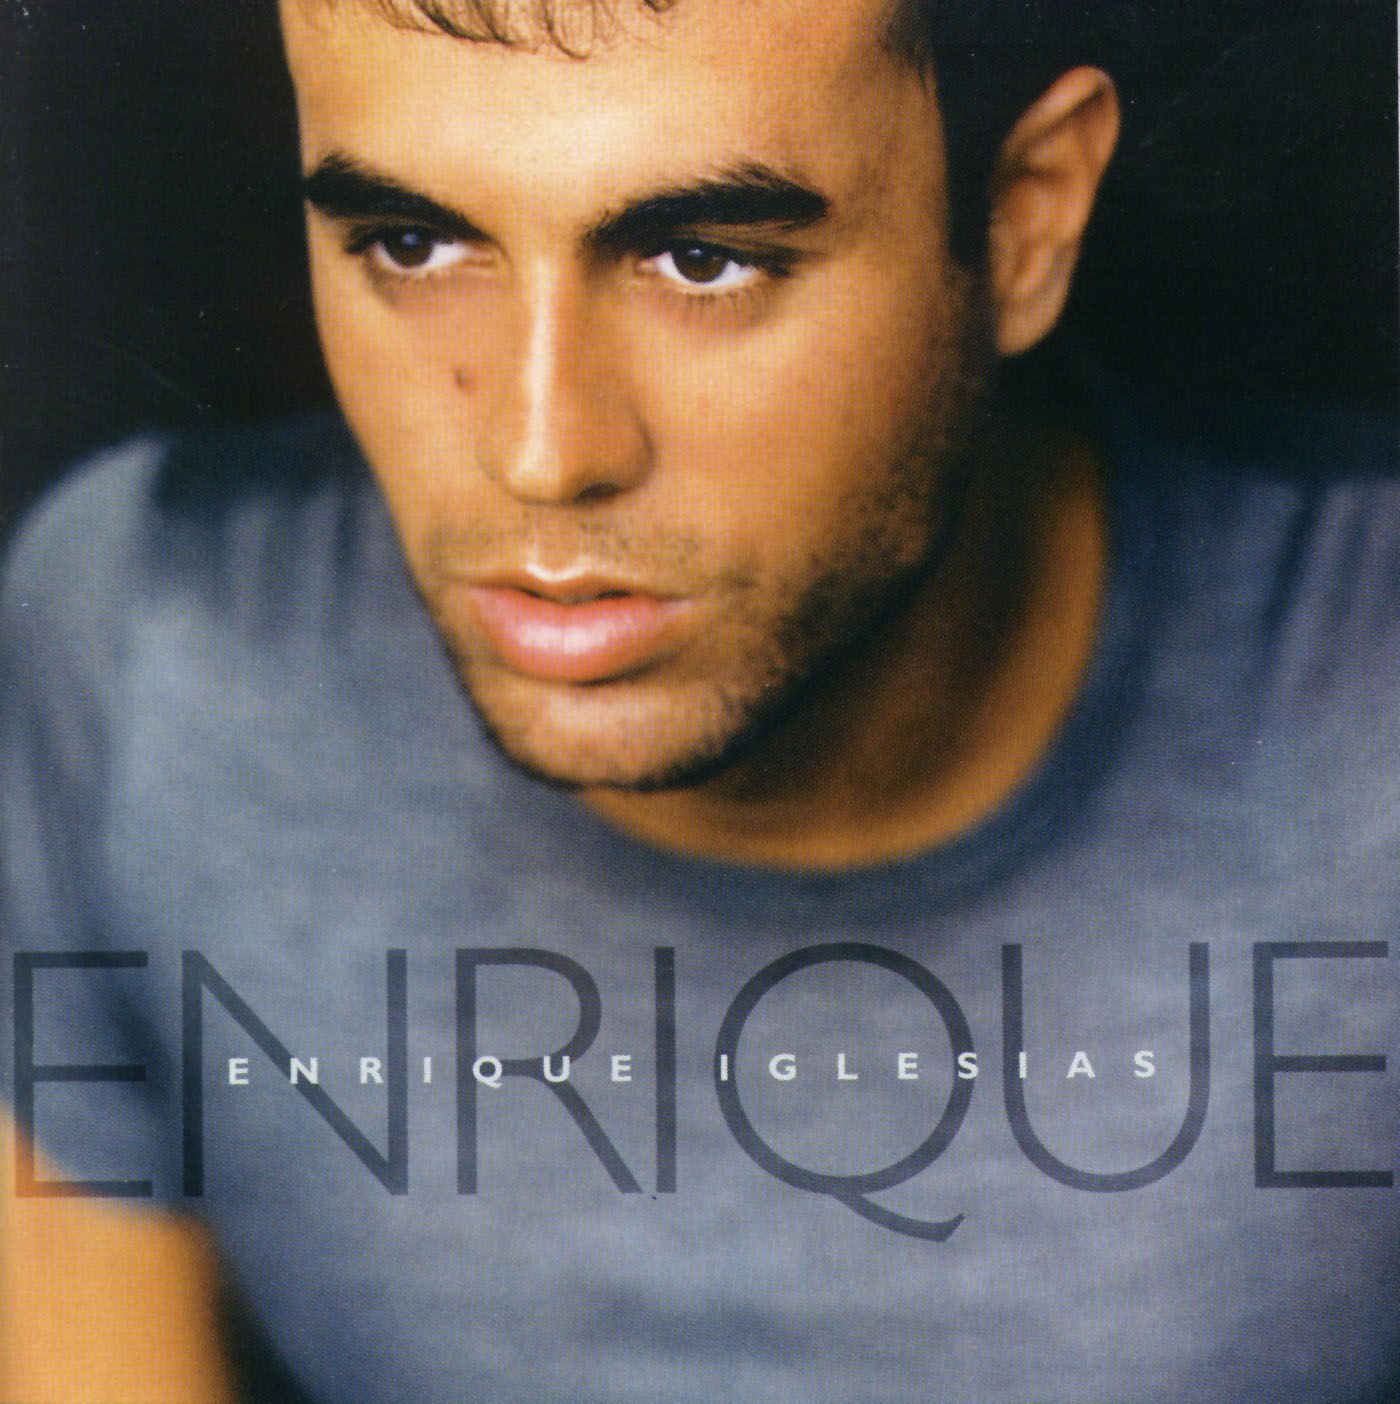 http://2.bp.blogspot.com/_zZrk_4LHcDM/TKBgXfTGsYI/AAAAAAAAATA/jxE-8v7jDhA/s1600/Enrique+Iglesias.jpg